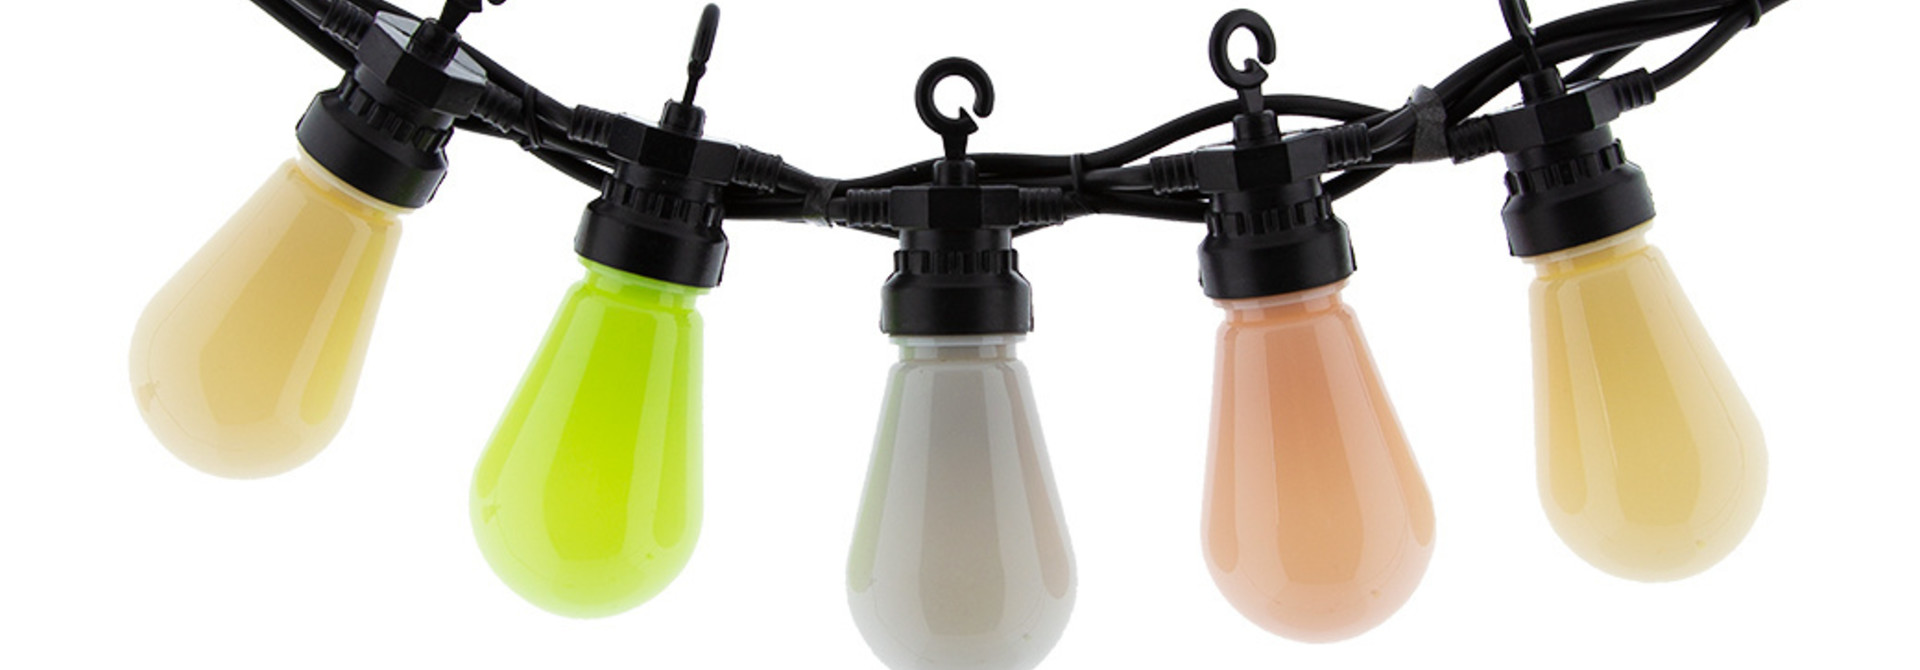 LEDR buiten feestverlichting groen en roze - Outdoor Patio Lichtslinger Paradise - 10 LED lampen - Edison Bulbs